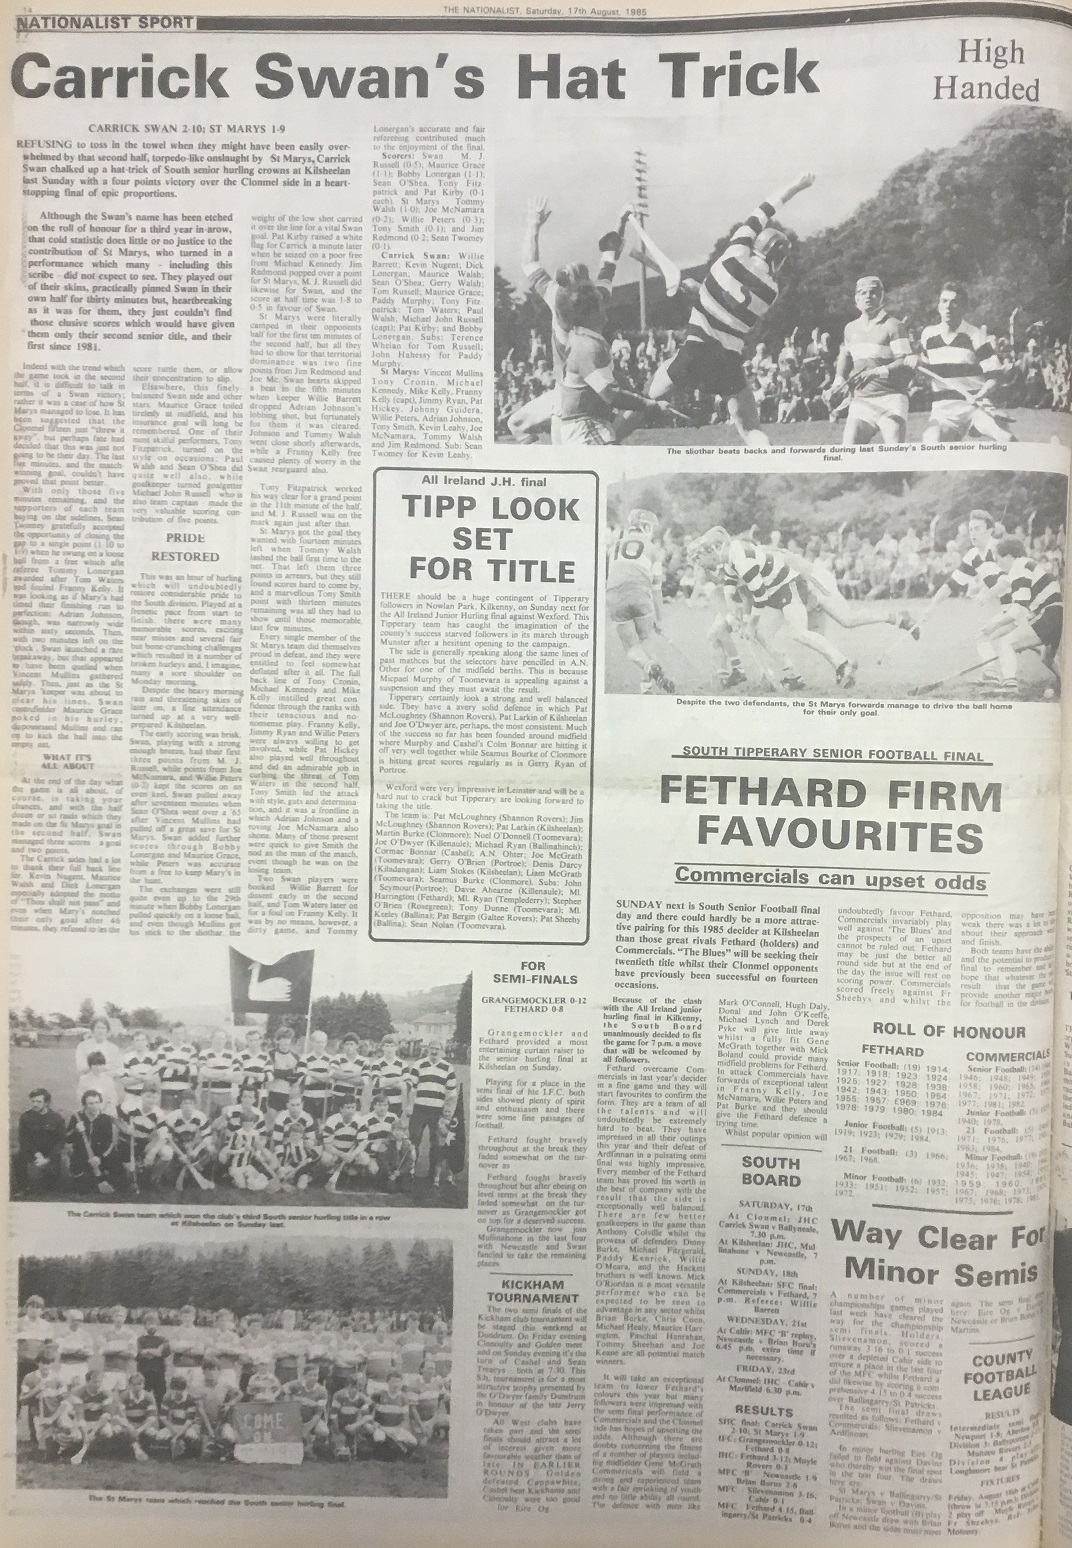 1985 South hurling final